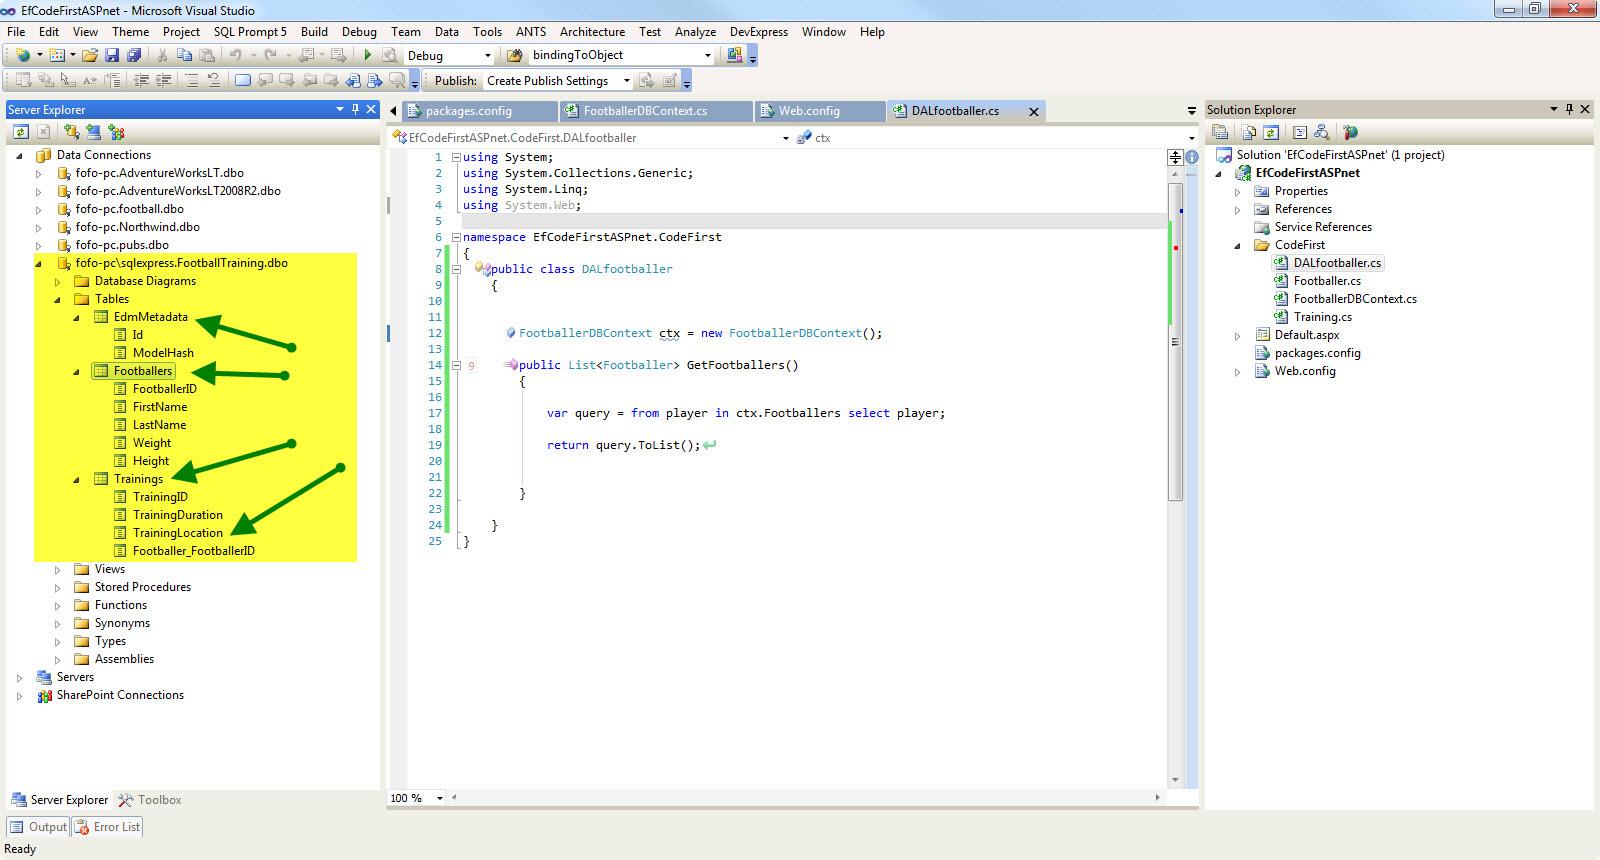 Nikolaos Kantzelis ASP Net Blog - Using the Code First